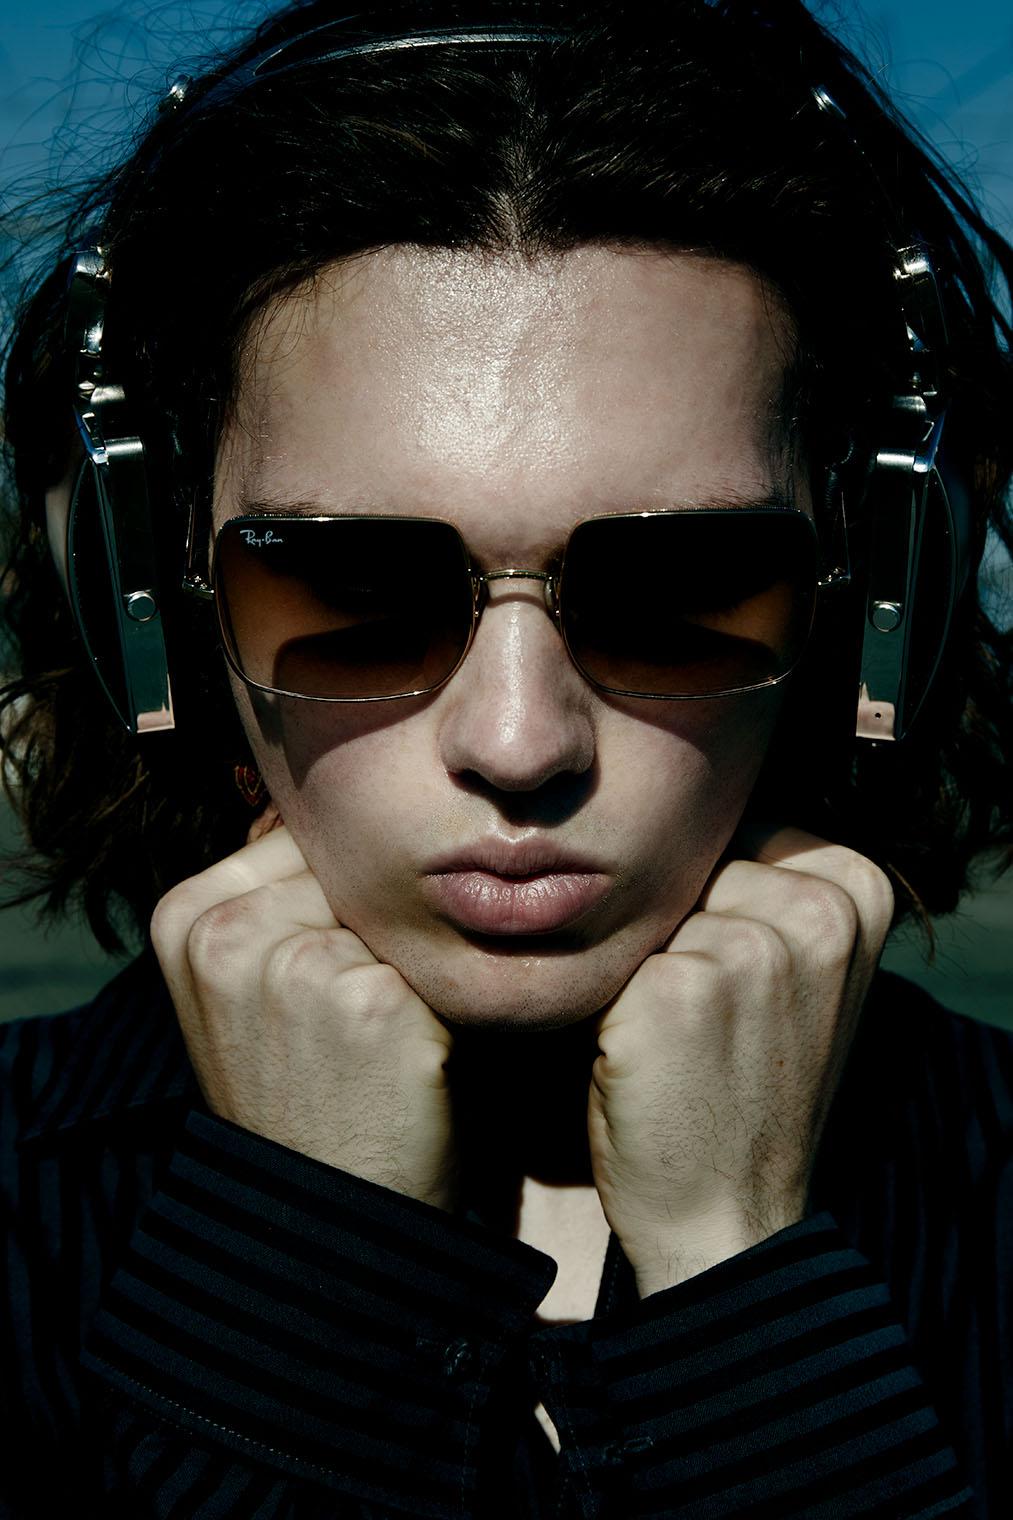 man with headphones - stylish fashion portrait closeup